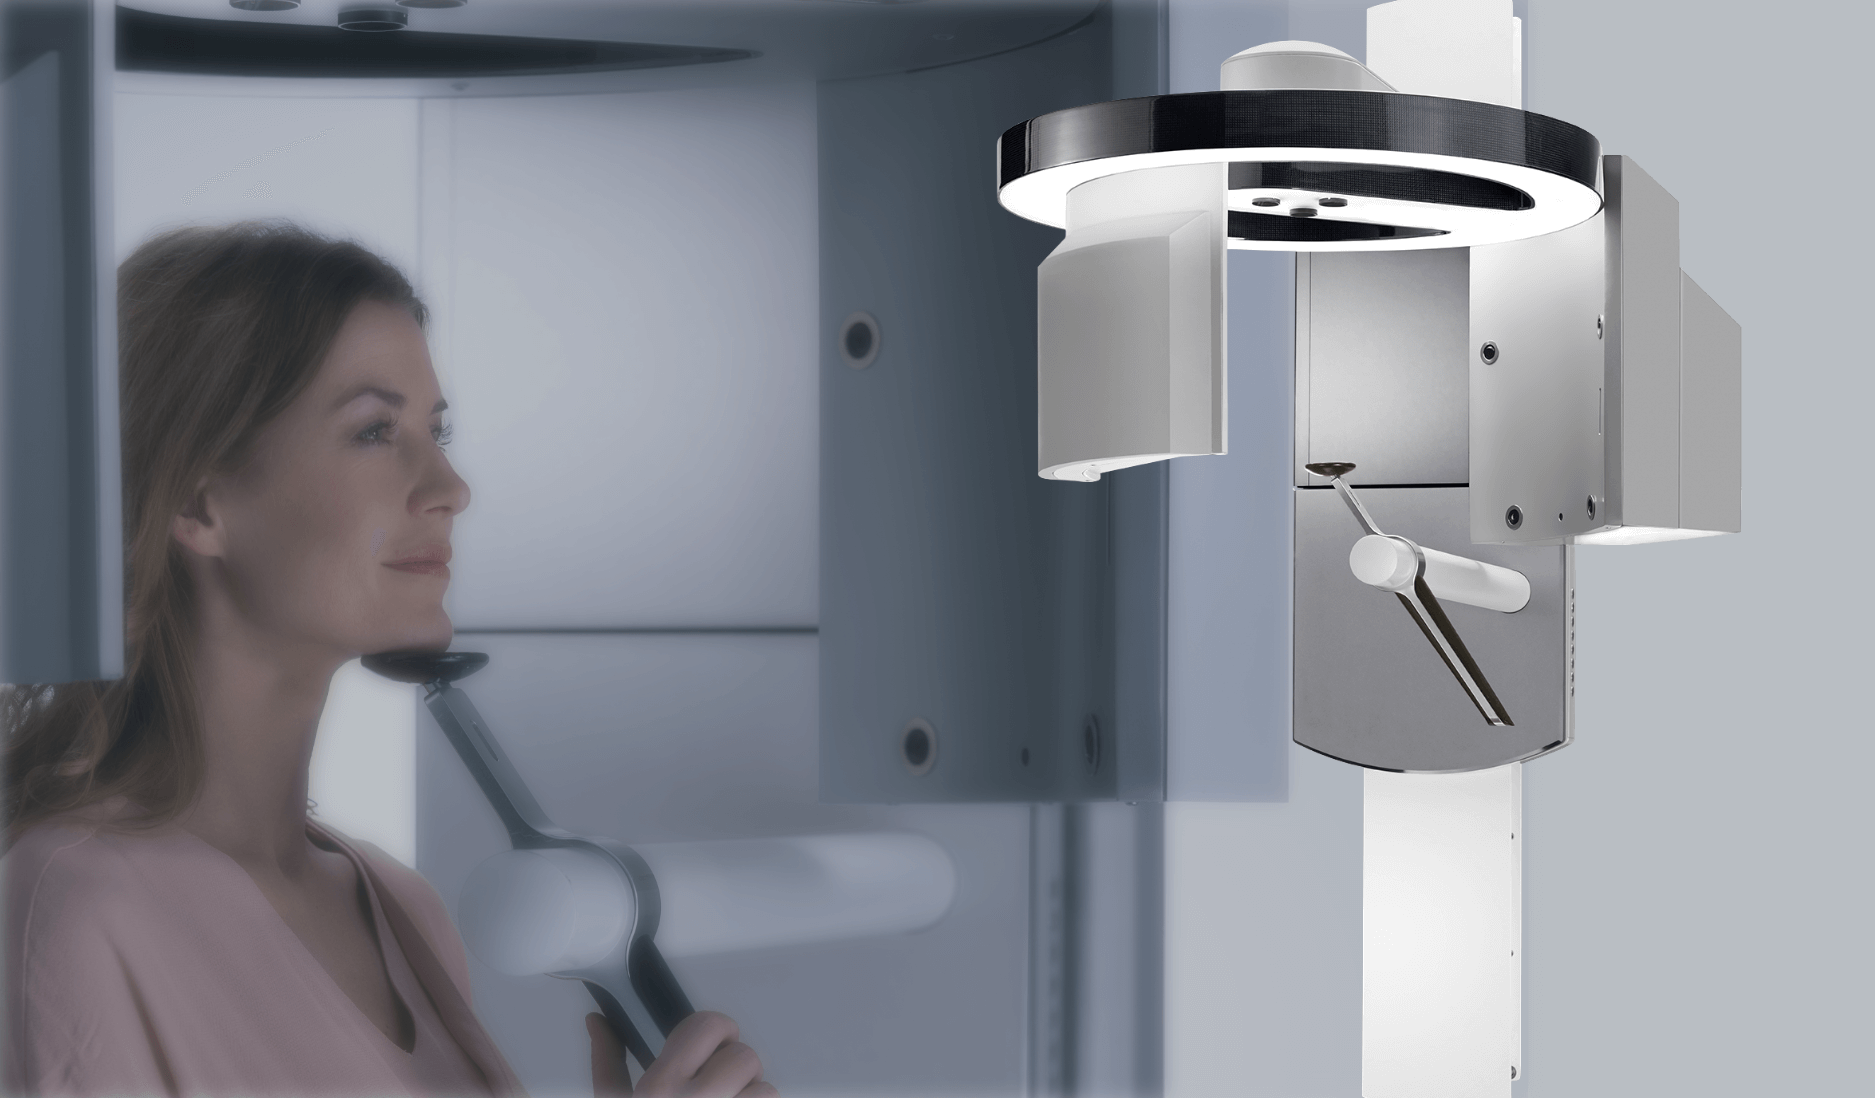 scanner dentale x1 di 3shape